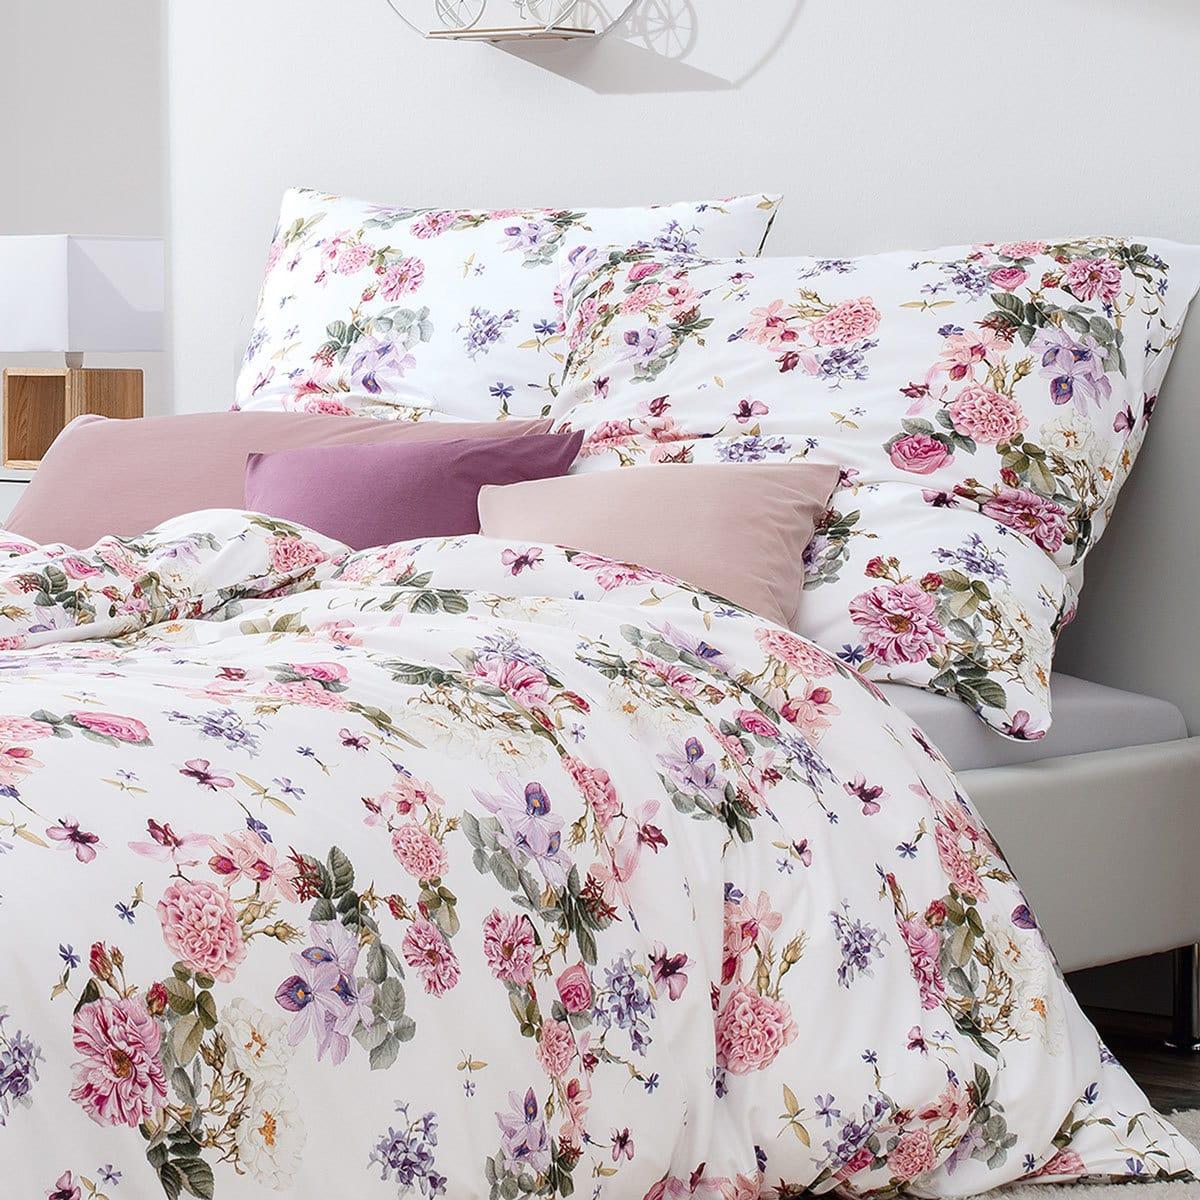 estella mako interlock jersey bettw sche olivia maulbeer. Black Bedroom Furniture Sets. Home Design Ideas